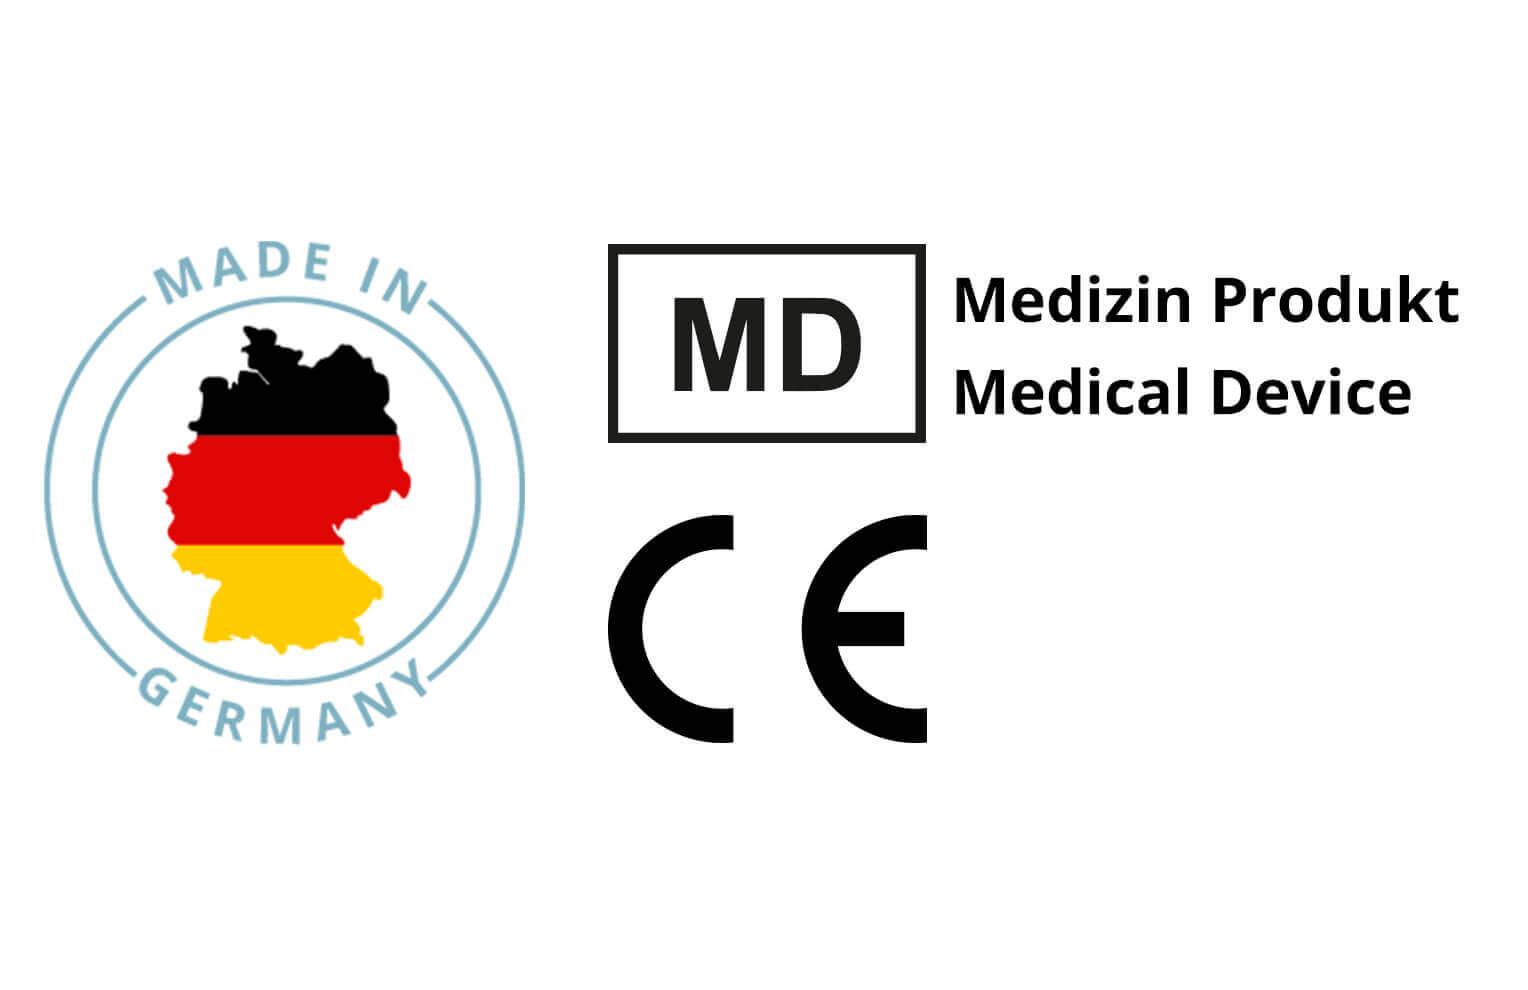 Made in Germany und CE-Konform